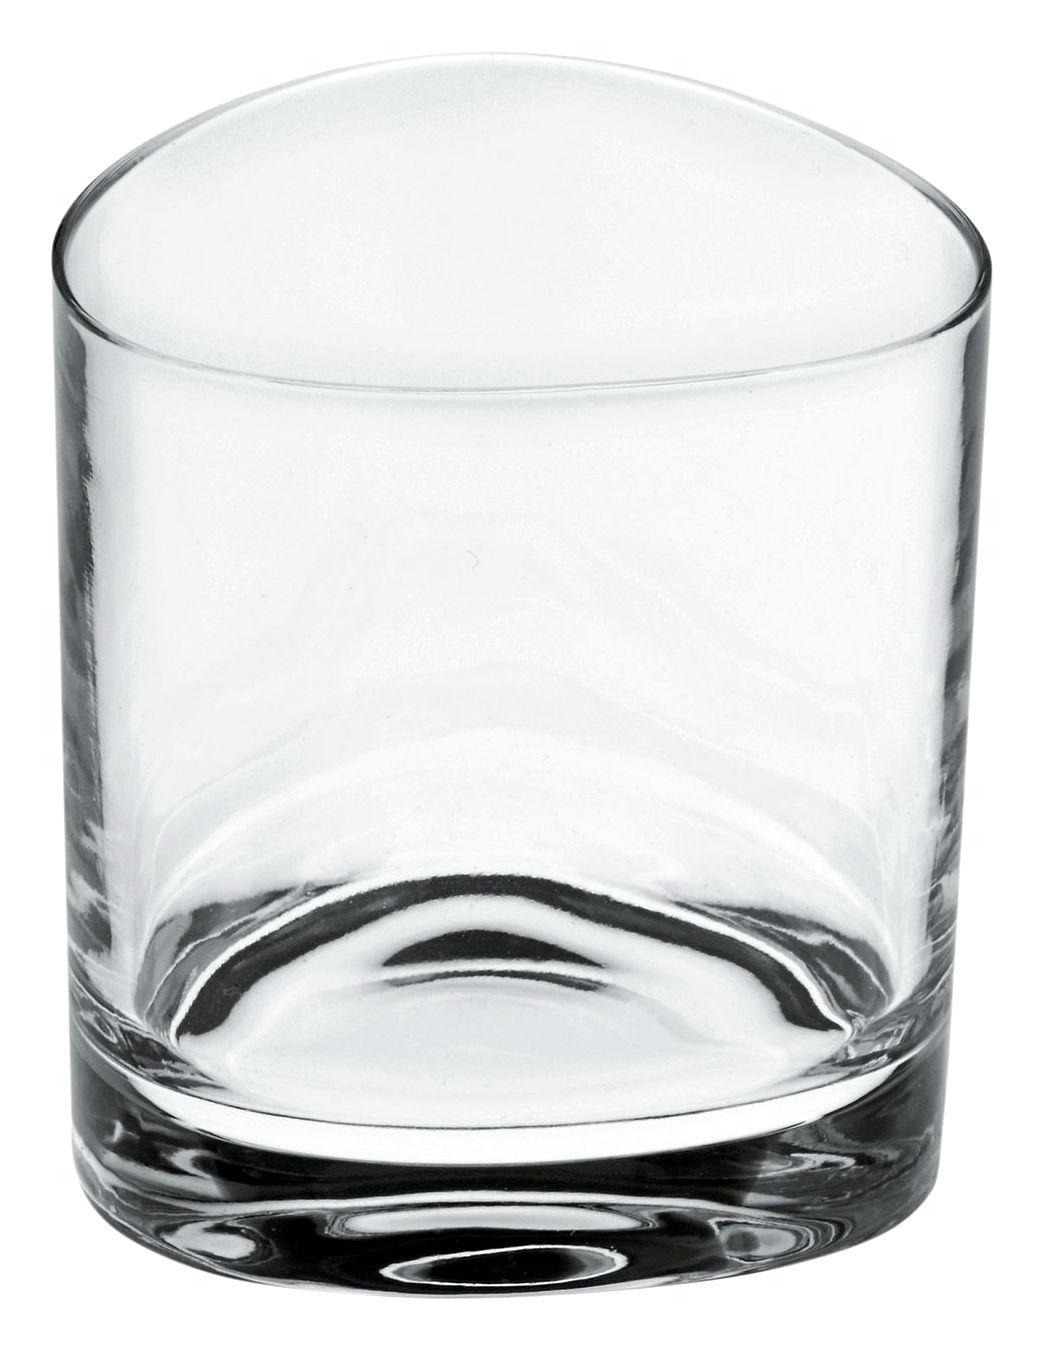 Arts de la table - Verres  - Verre à vin Colombina - Alessi - Cristal transparent - H 7.8 cm - Verre